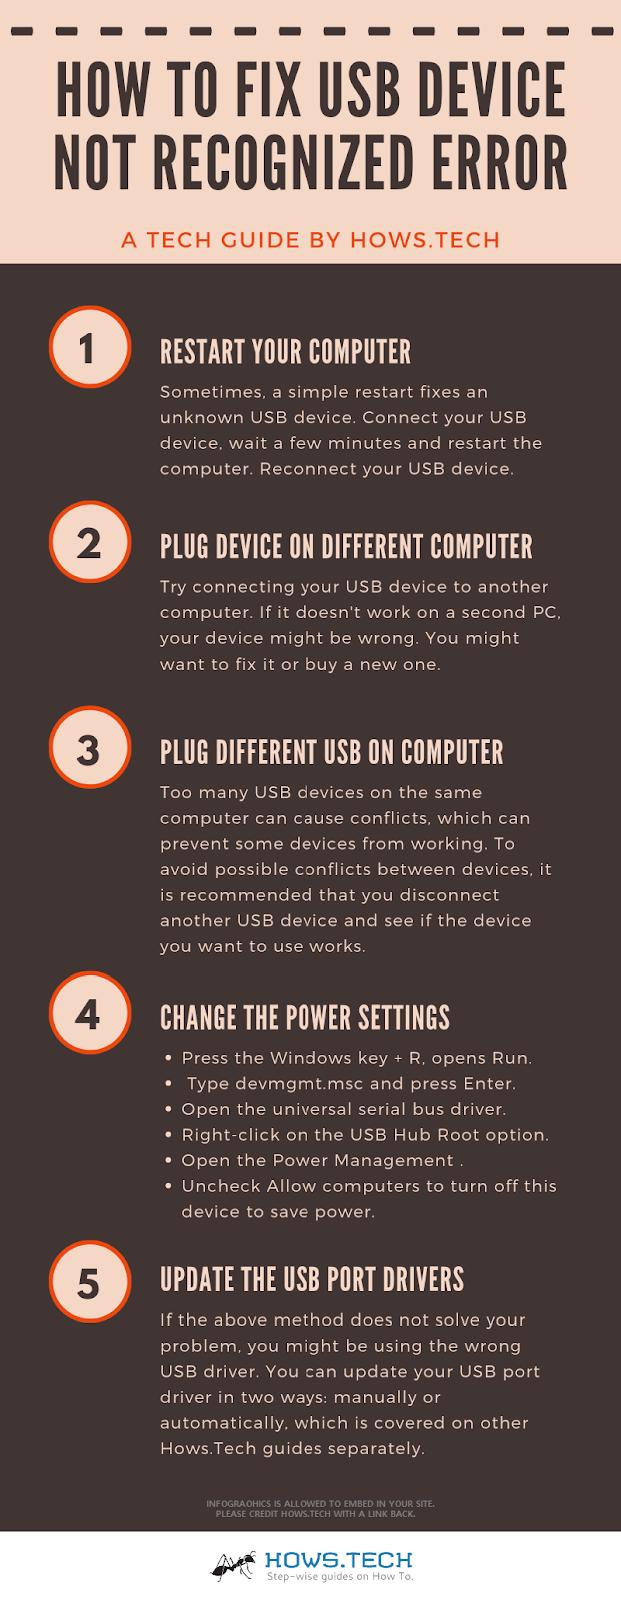 Fix USB Device Not Recognized Error Info-Graphics